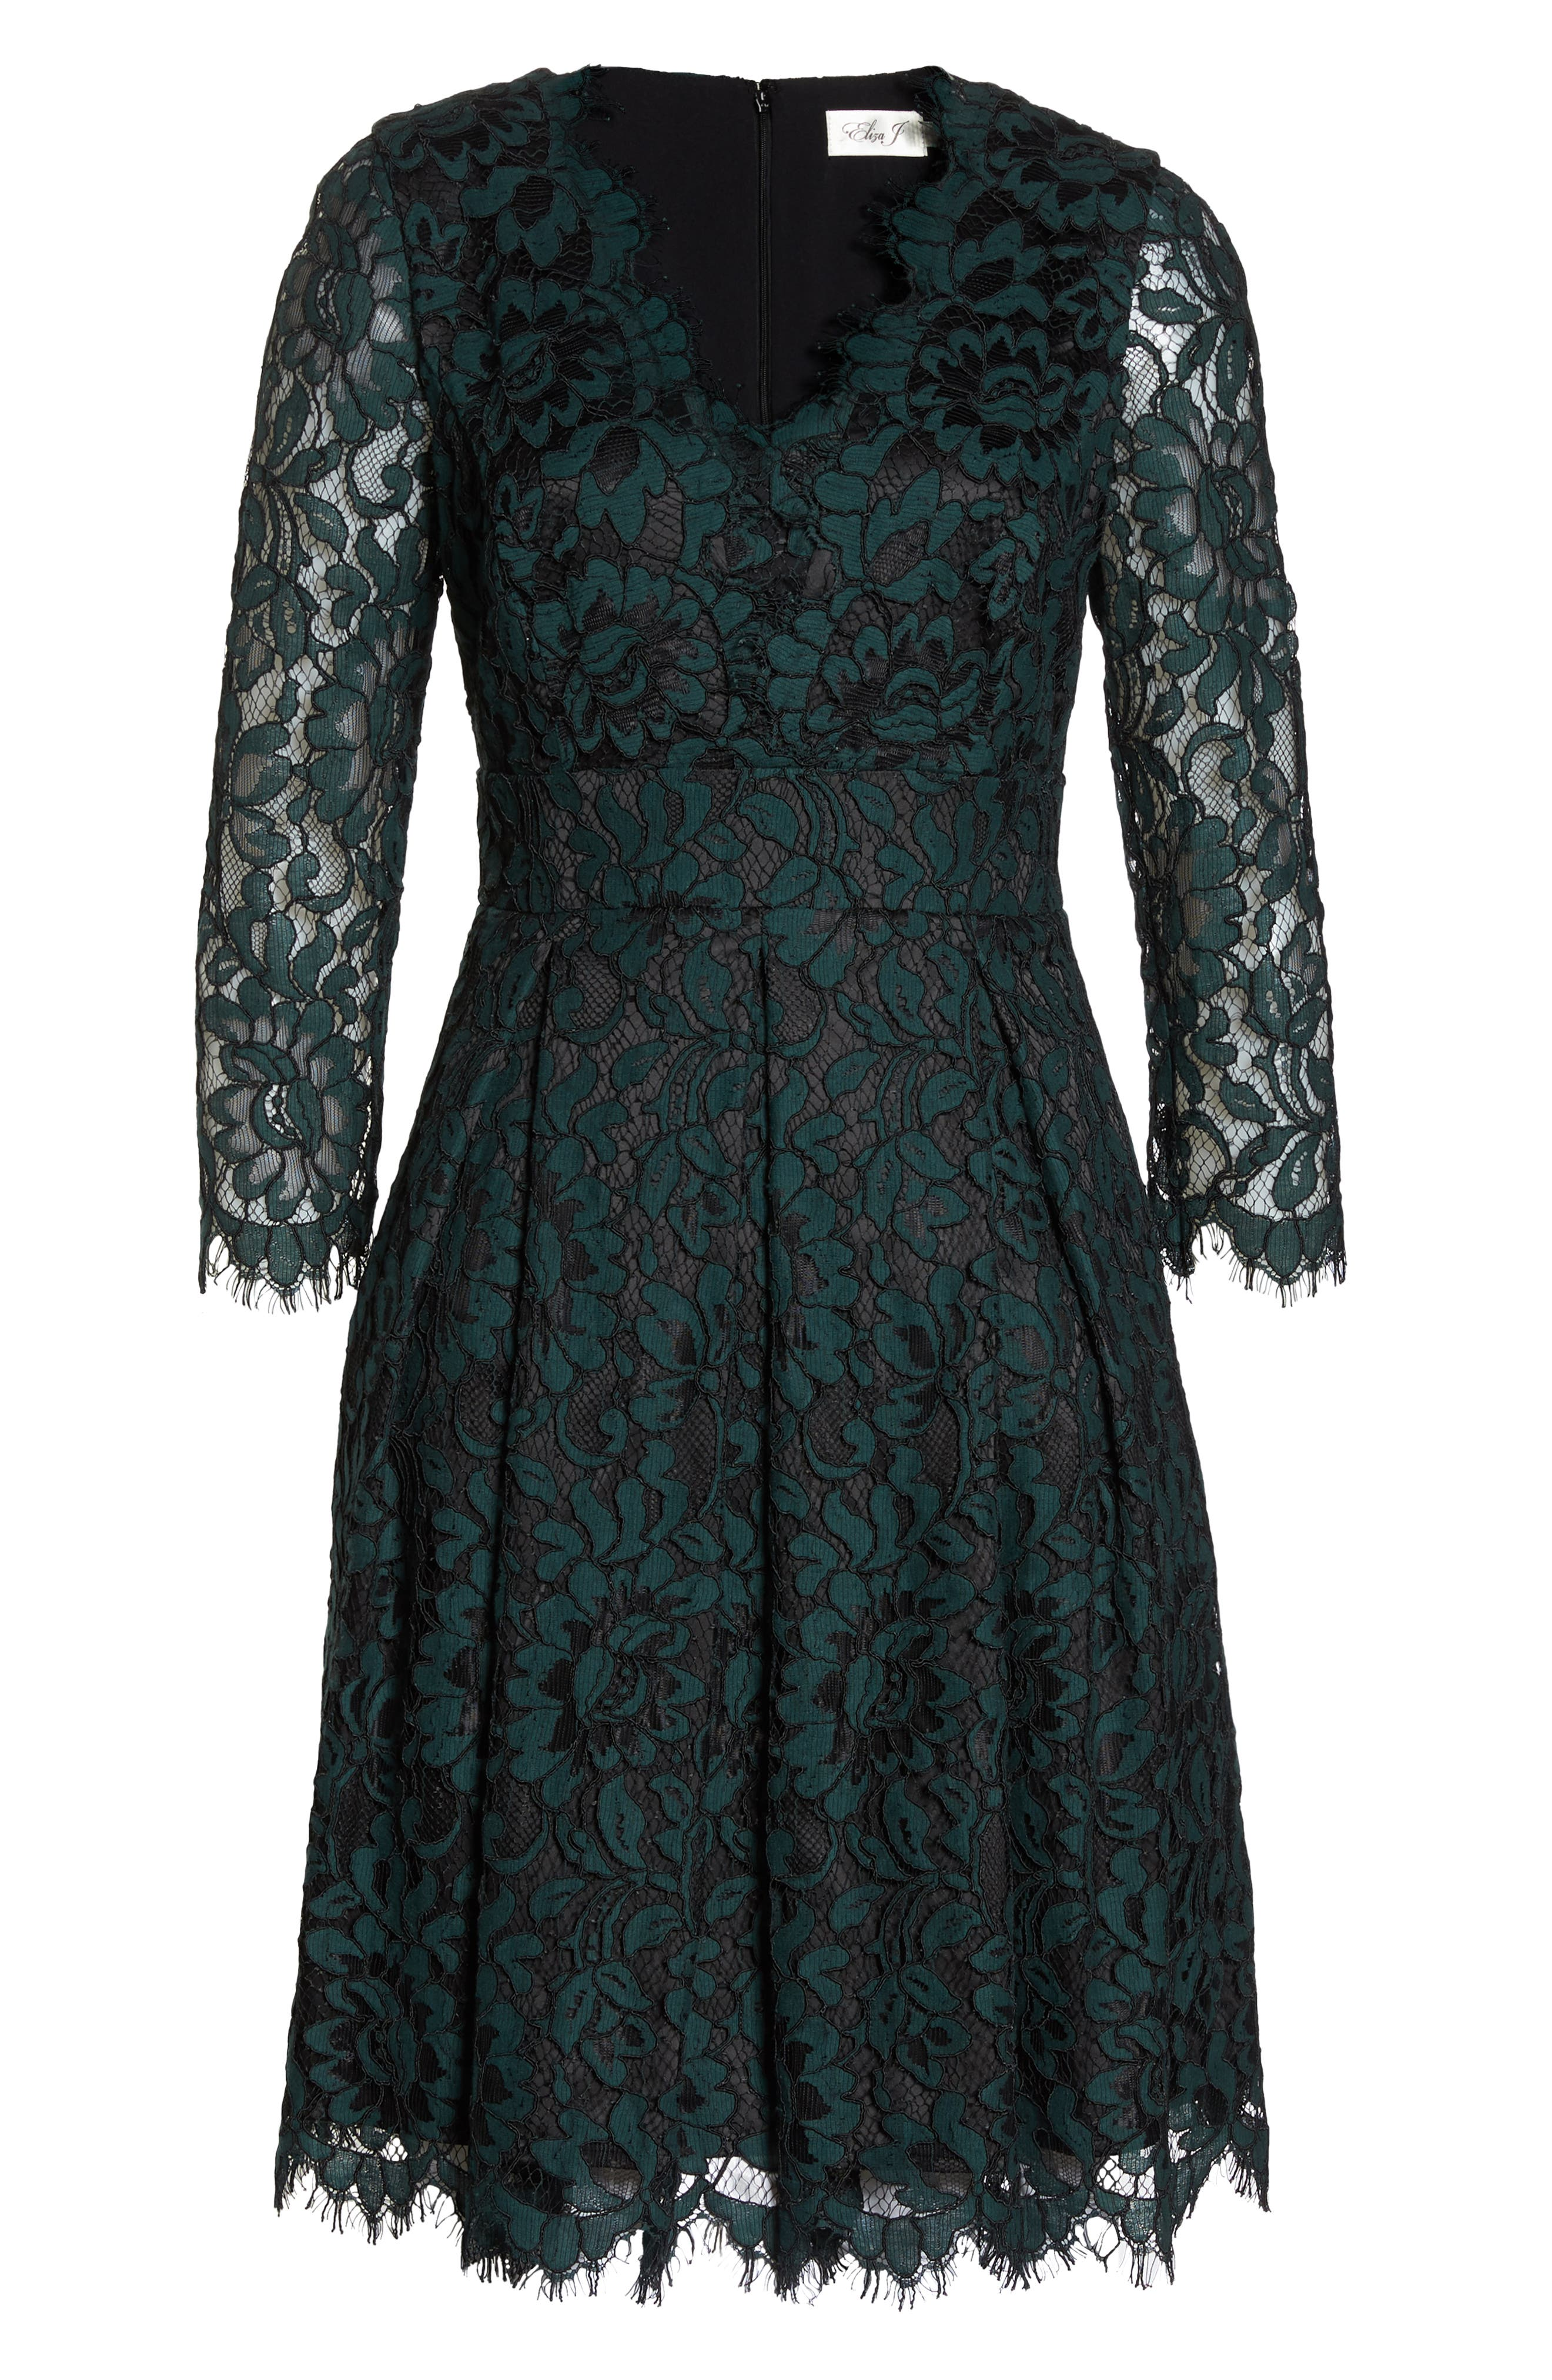 ELIZA J, Lace V-Neck Fit & Flare Dress, Alternate thumbnail 7, color, 310